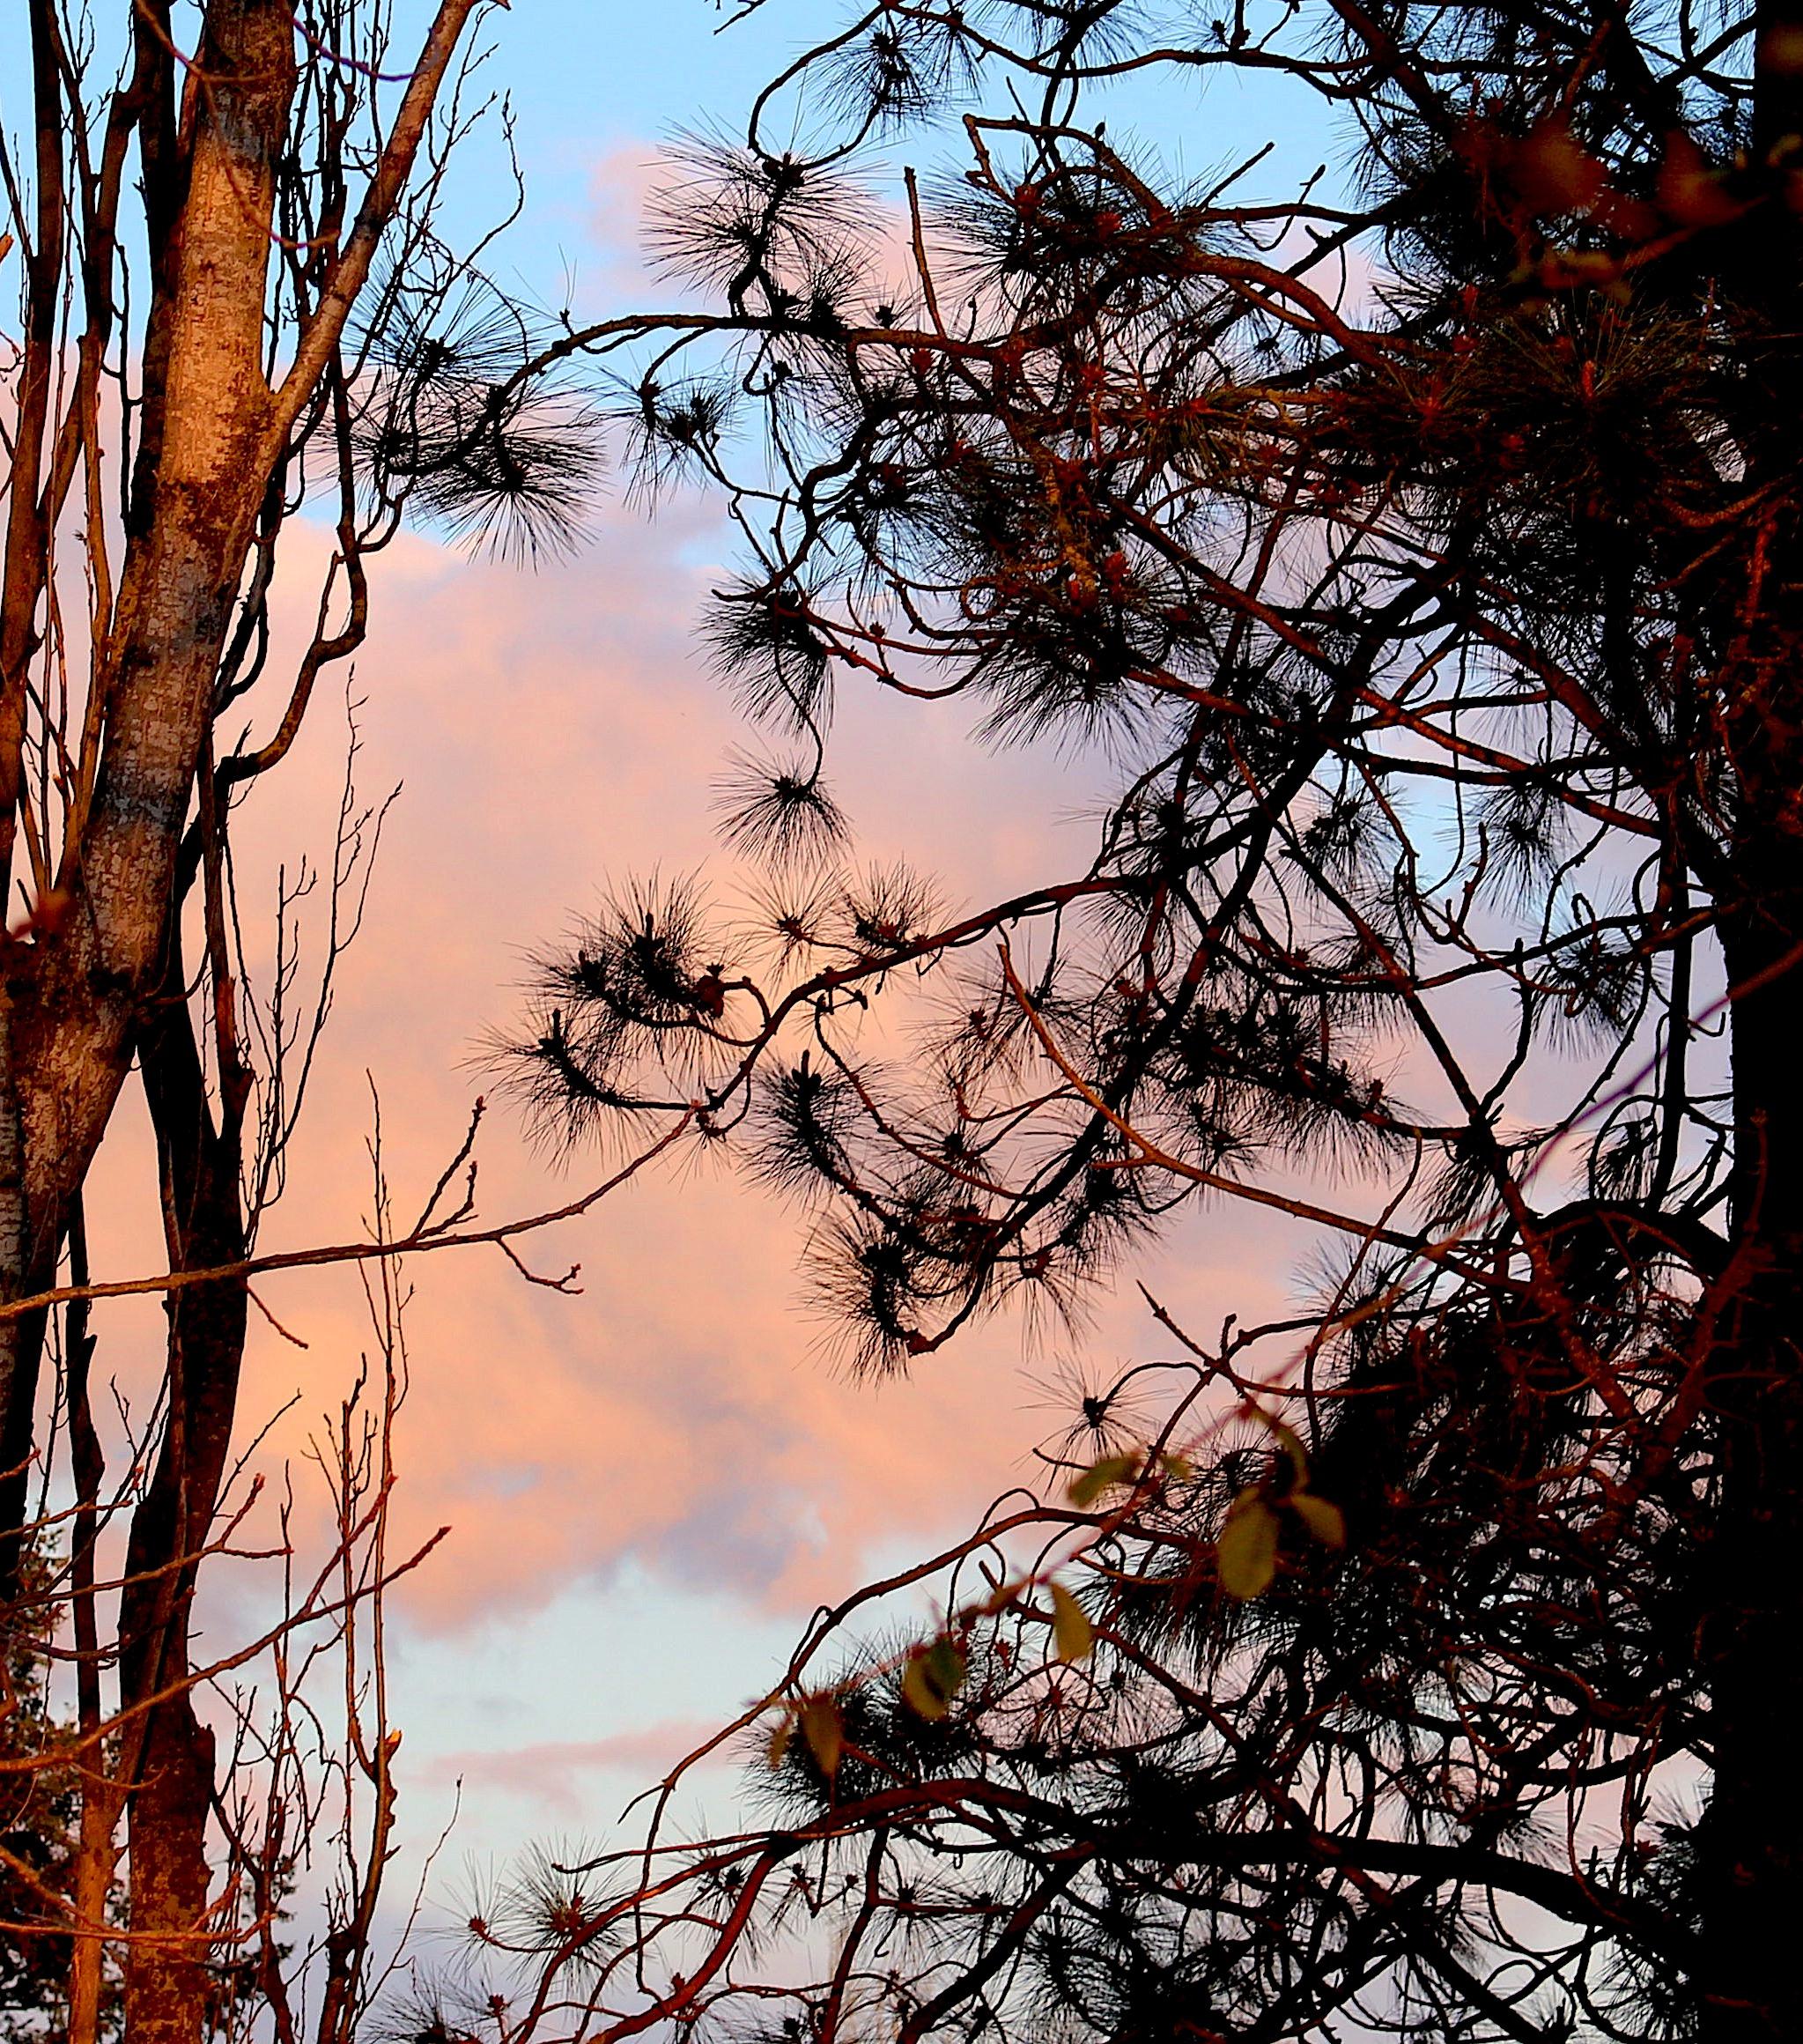 aprileveningtrees